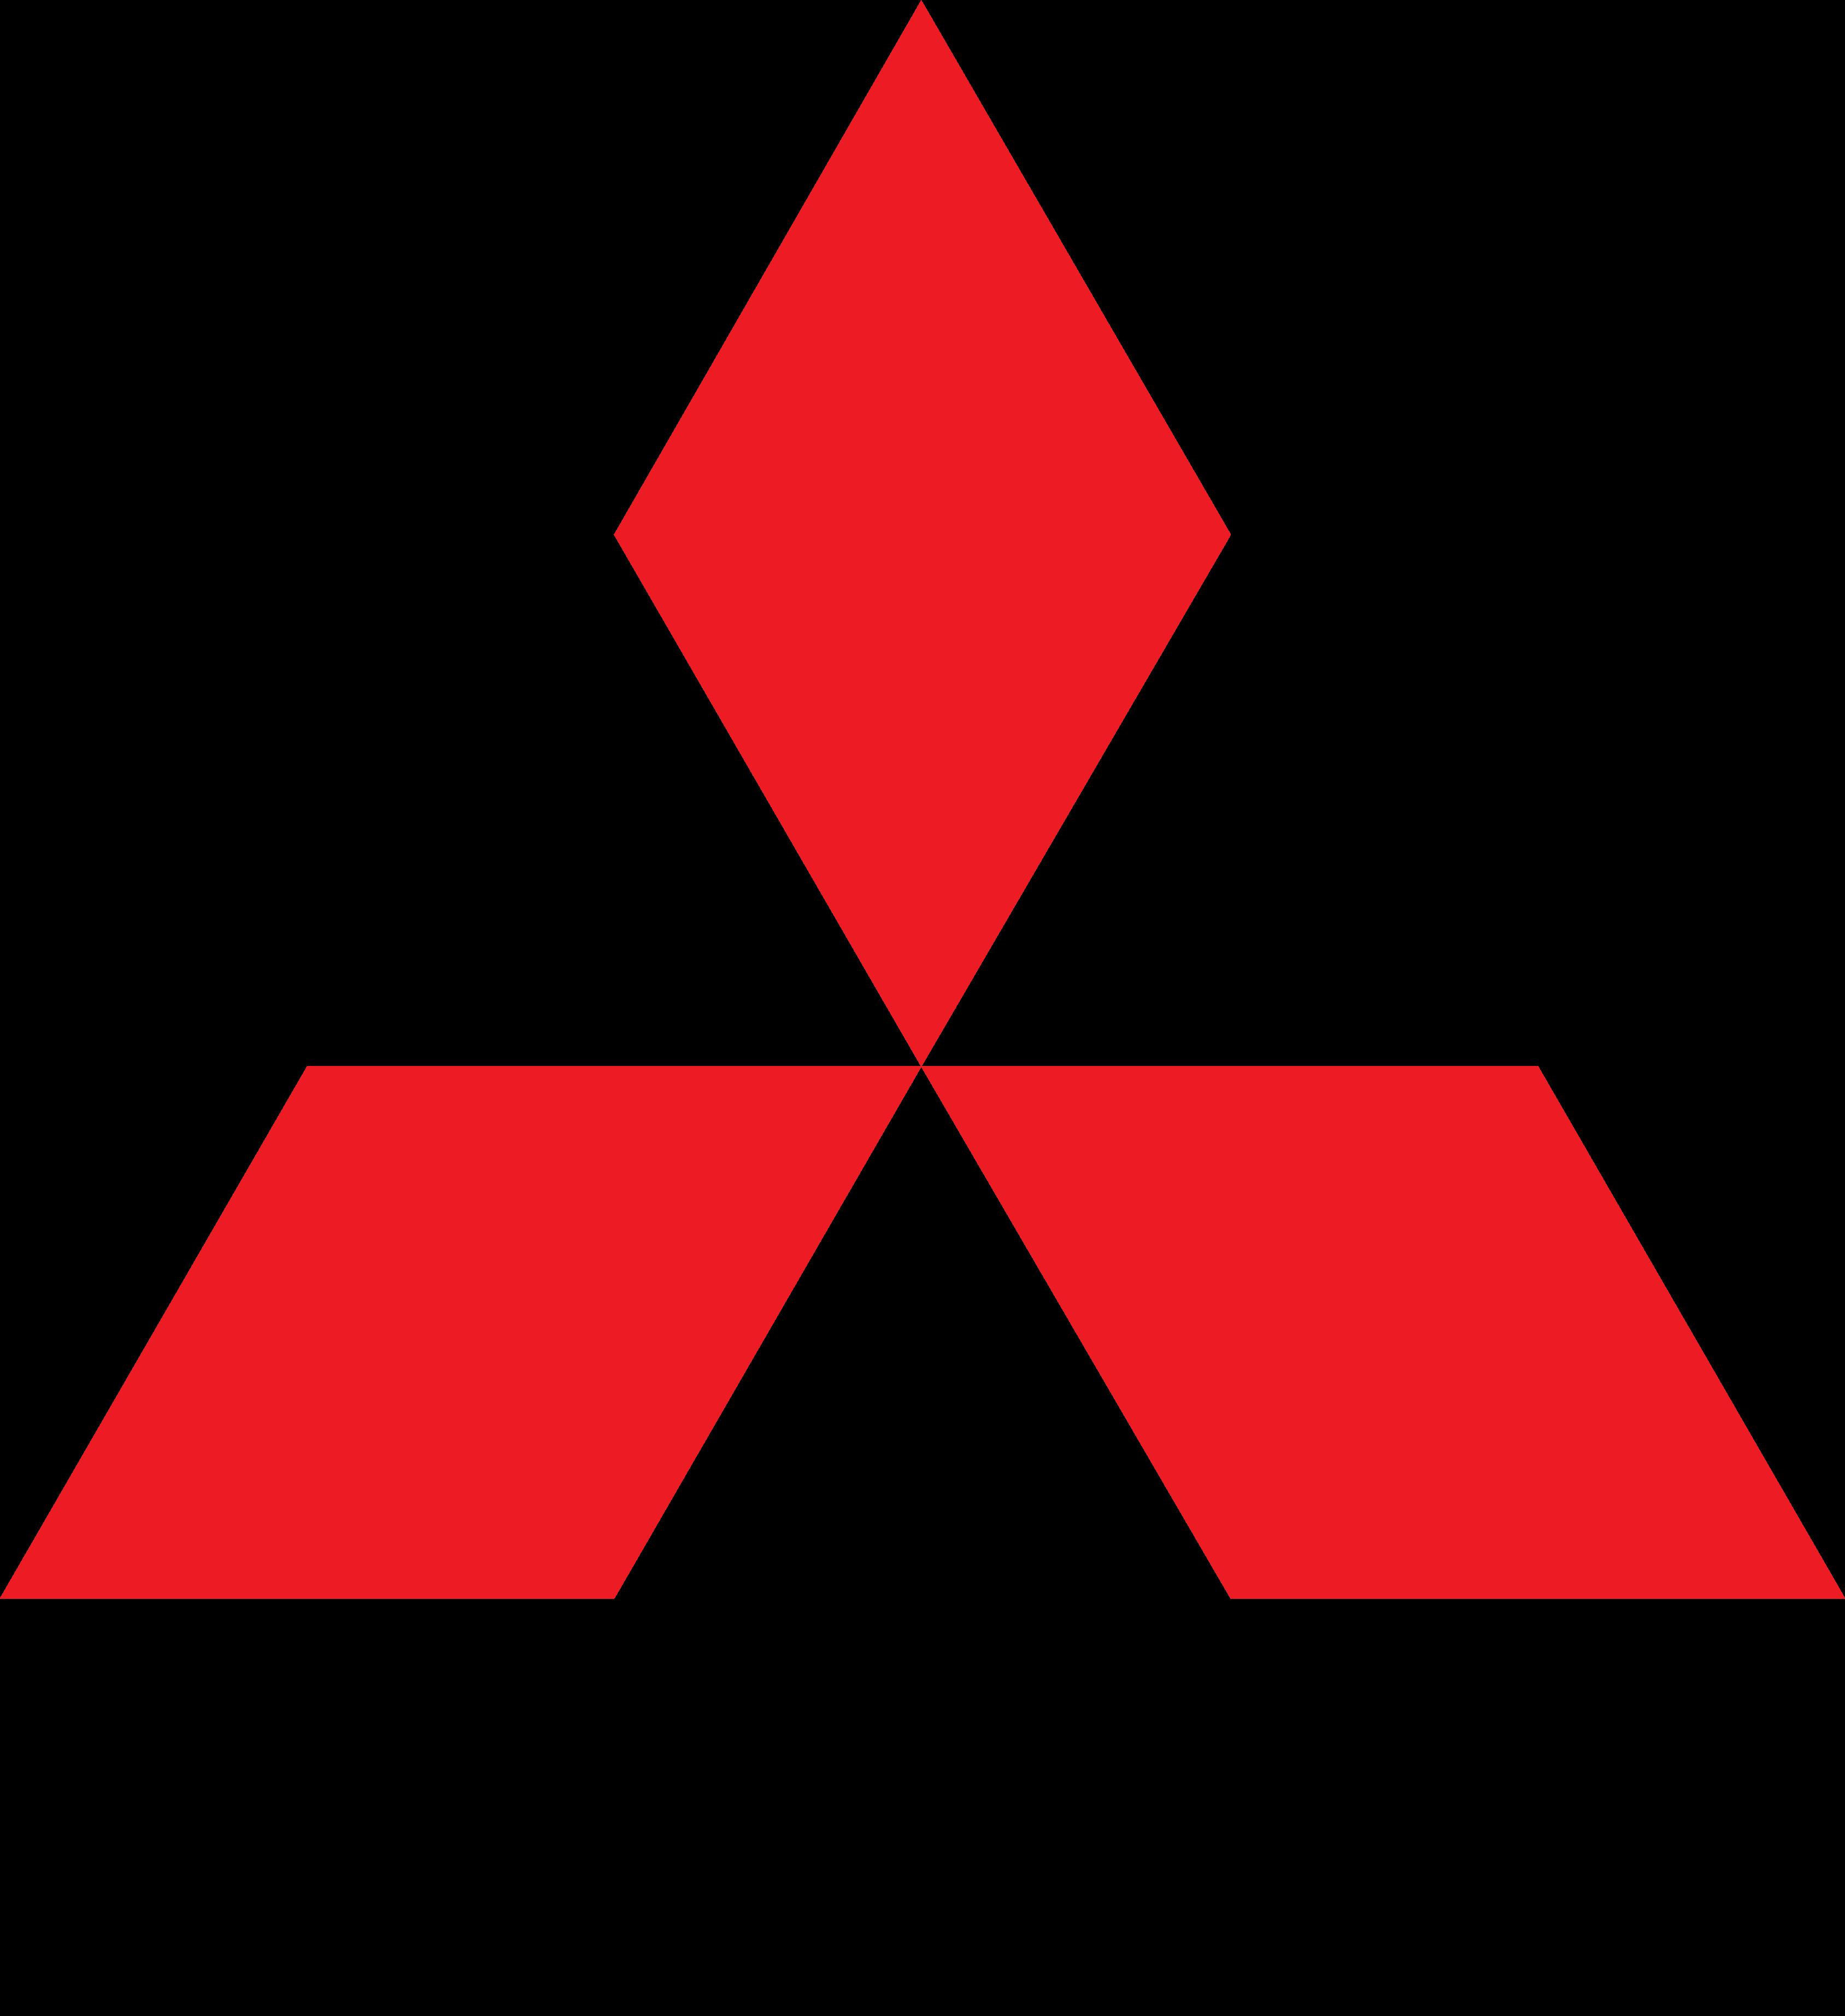 Mitsubishi logo PNG - Mitsubishi HD PNG